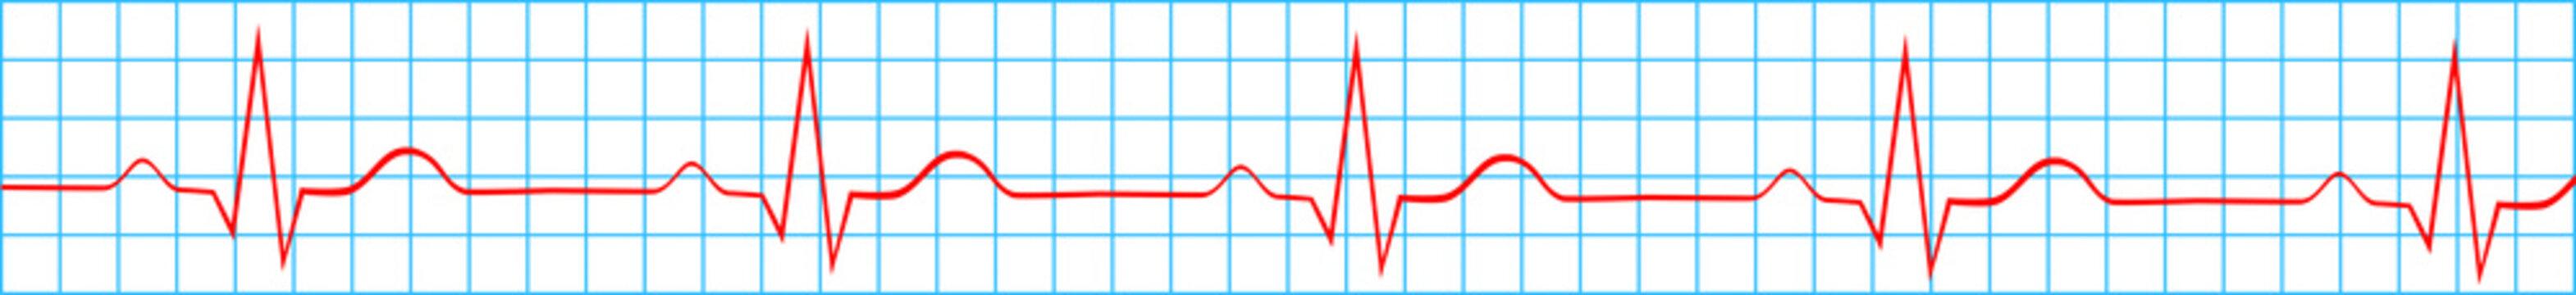 Heart Normal Sinus Rhythm On Electrocardiogram Record